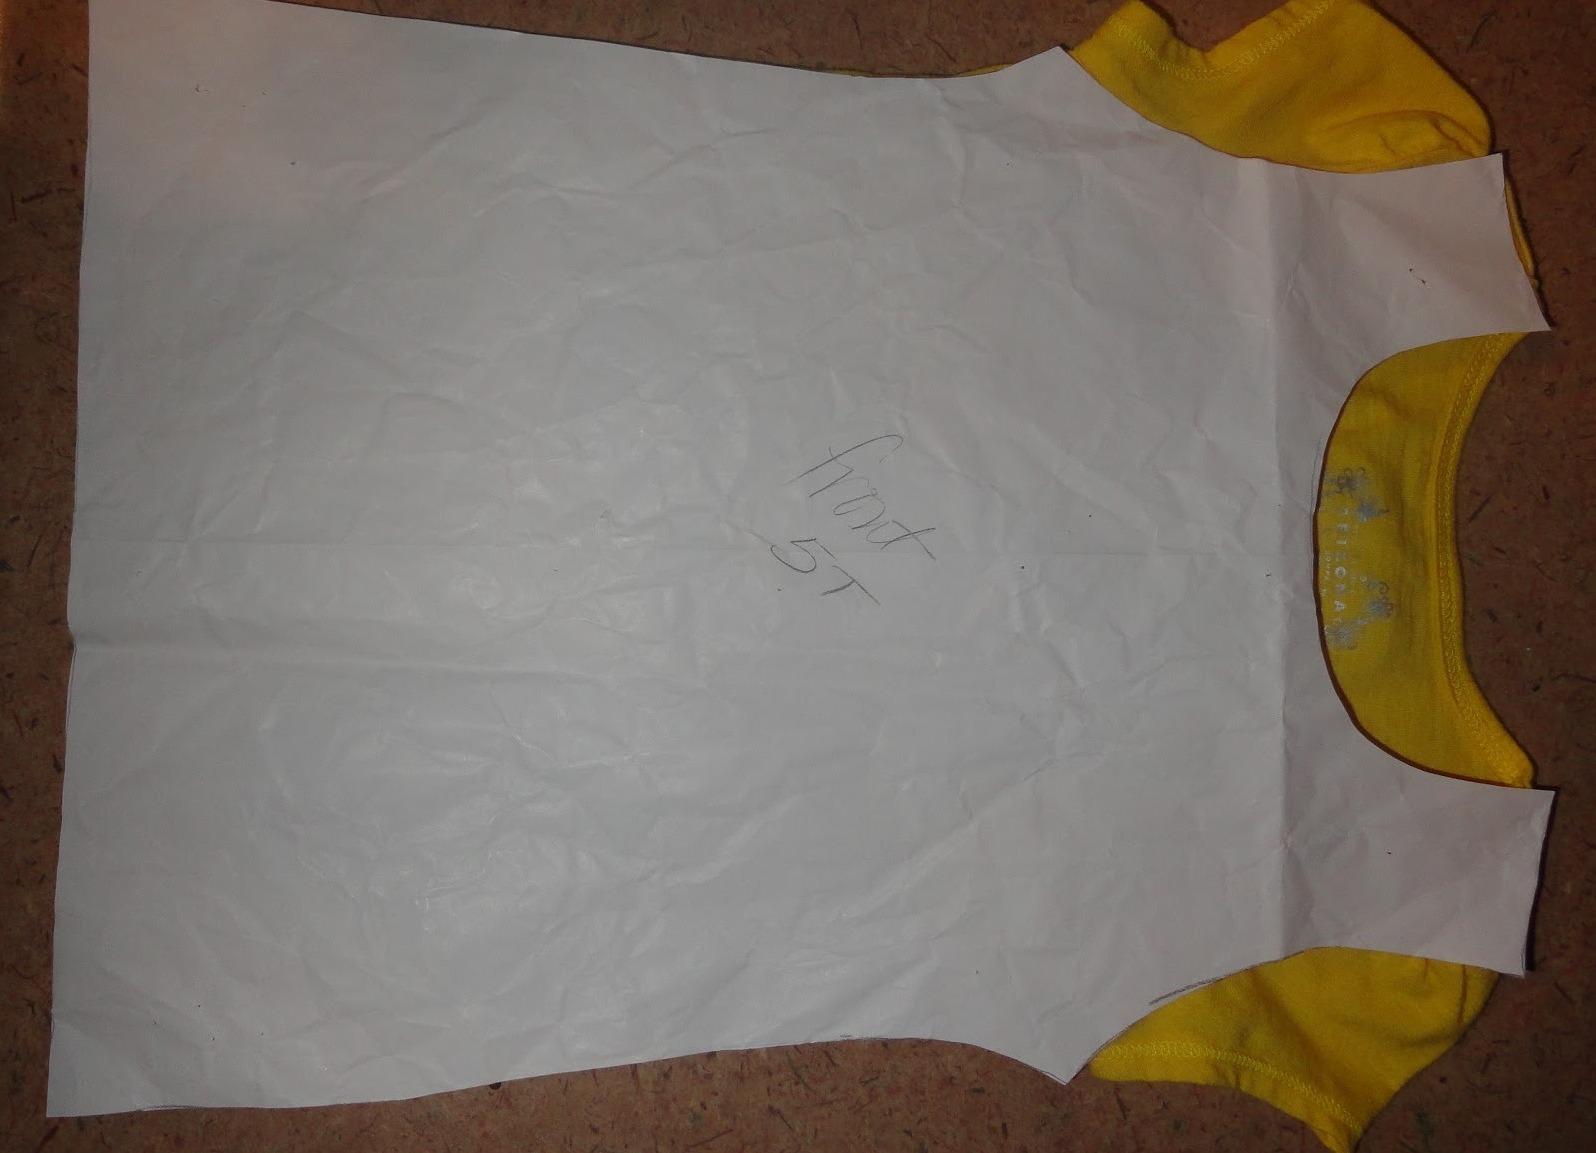 Пижама для ребенка своими руками фото 633